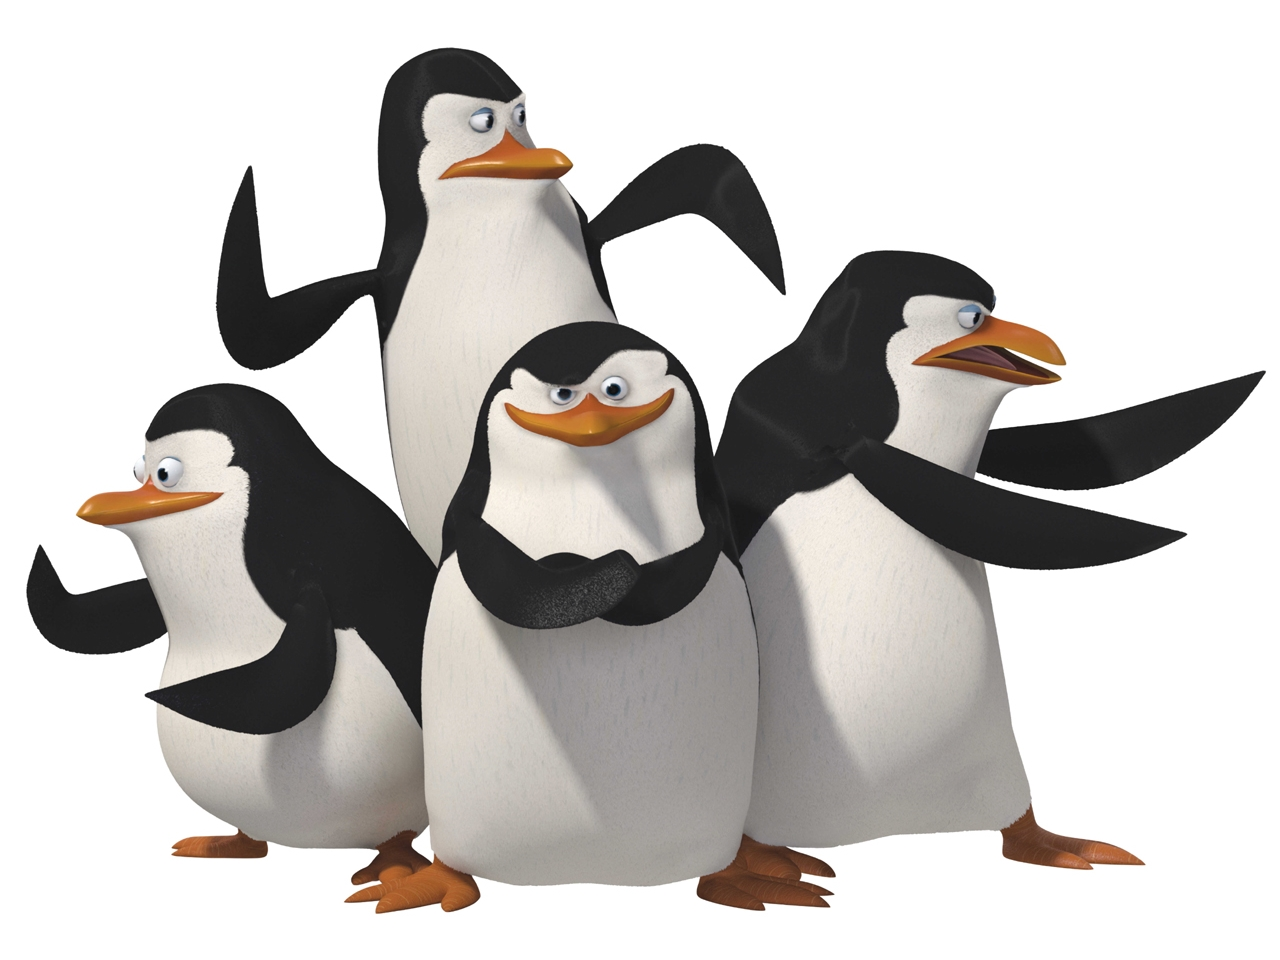 Pinguins of madagascar